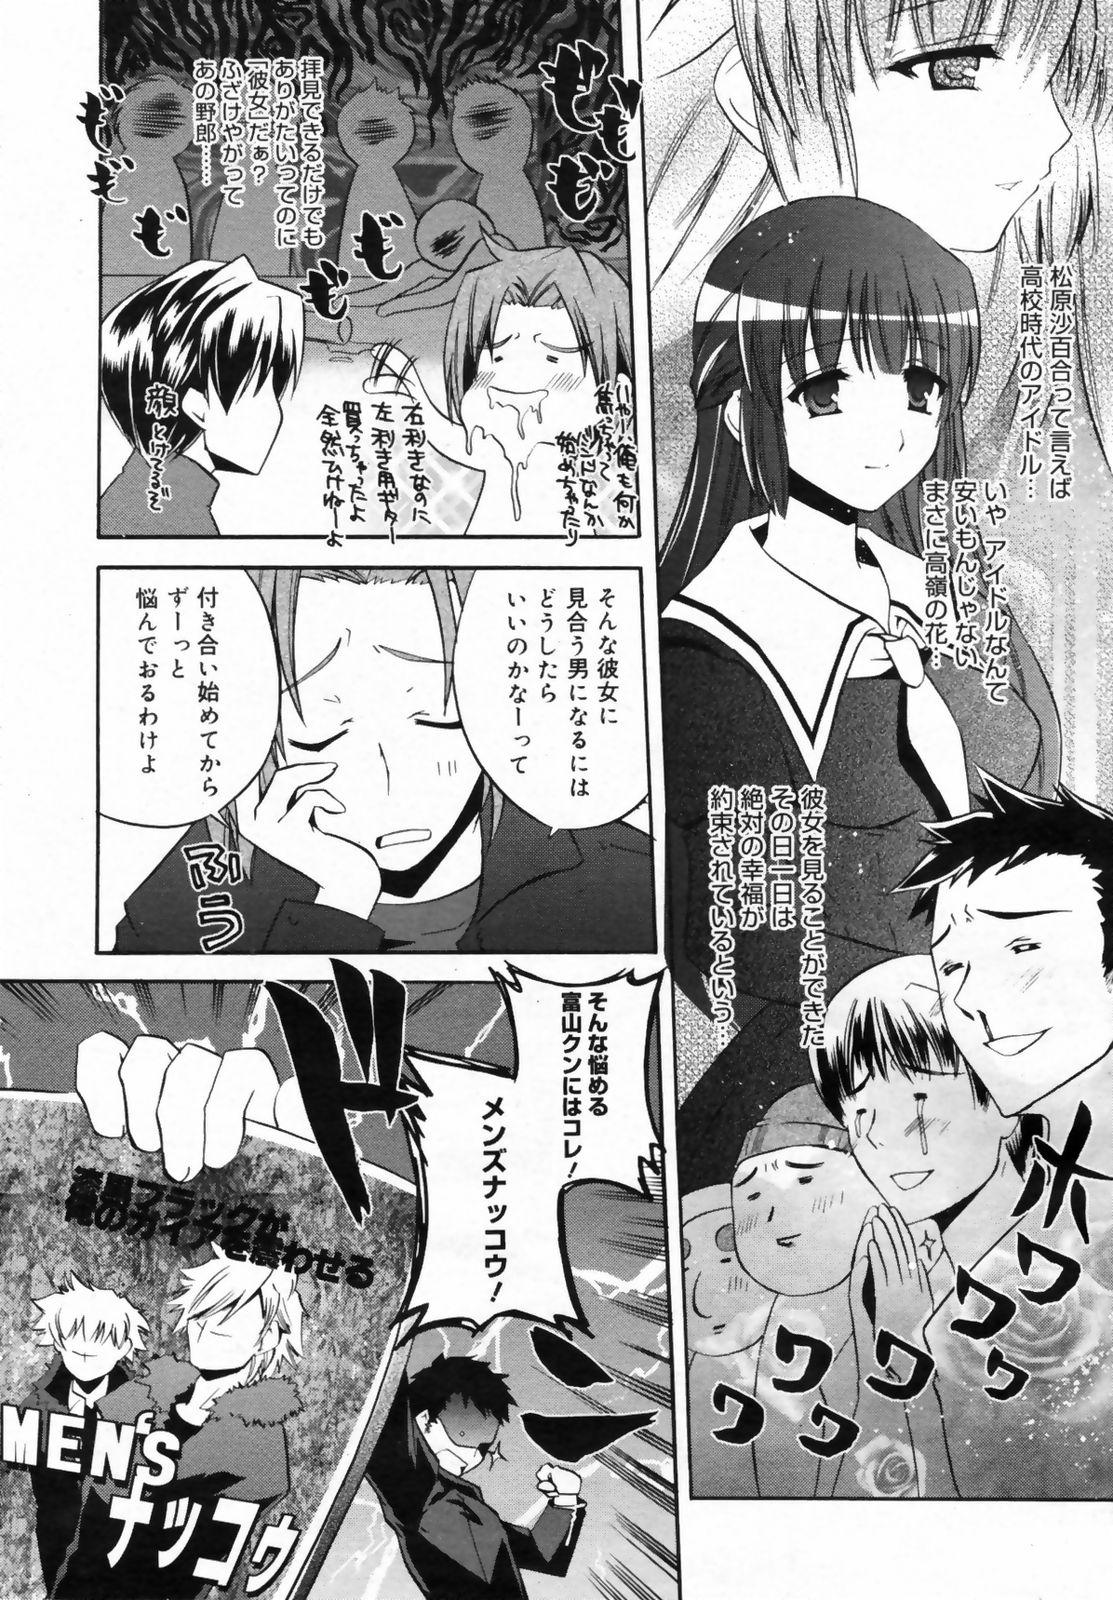 Manga Bangaichi 2009-02 Vol. 234 39